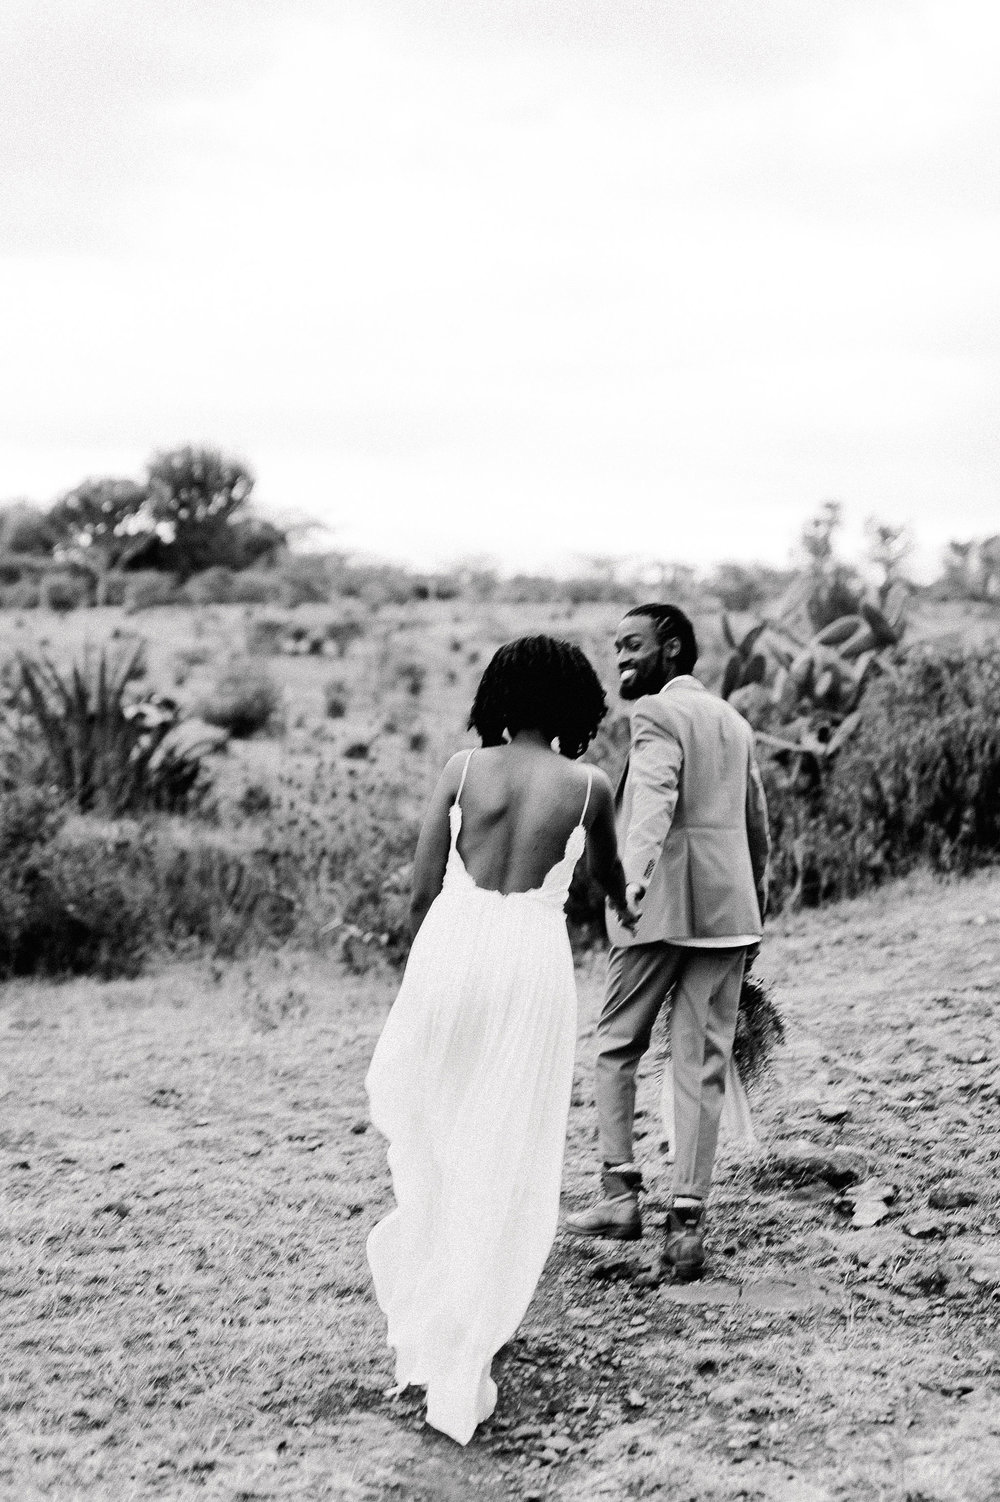 Anna-Hari-Photography-Destination-Wedding-Photographer-Kenya-103.jpg